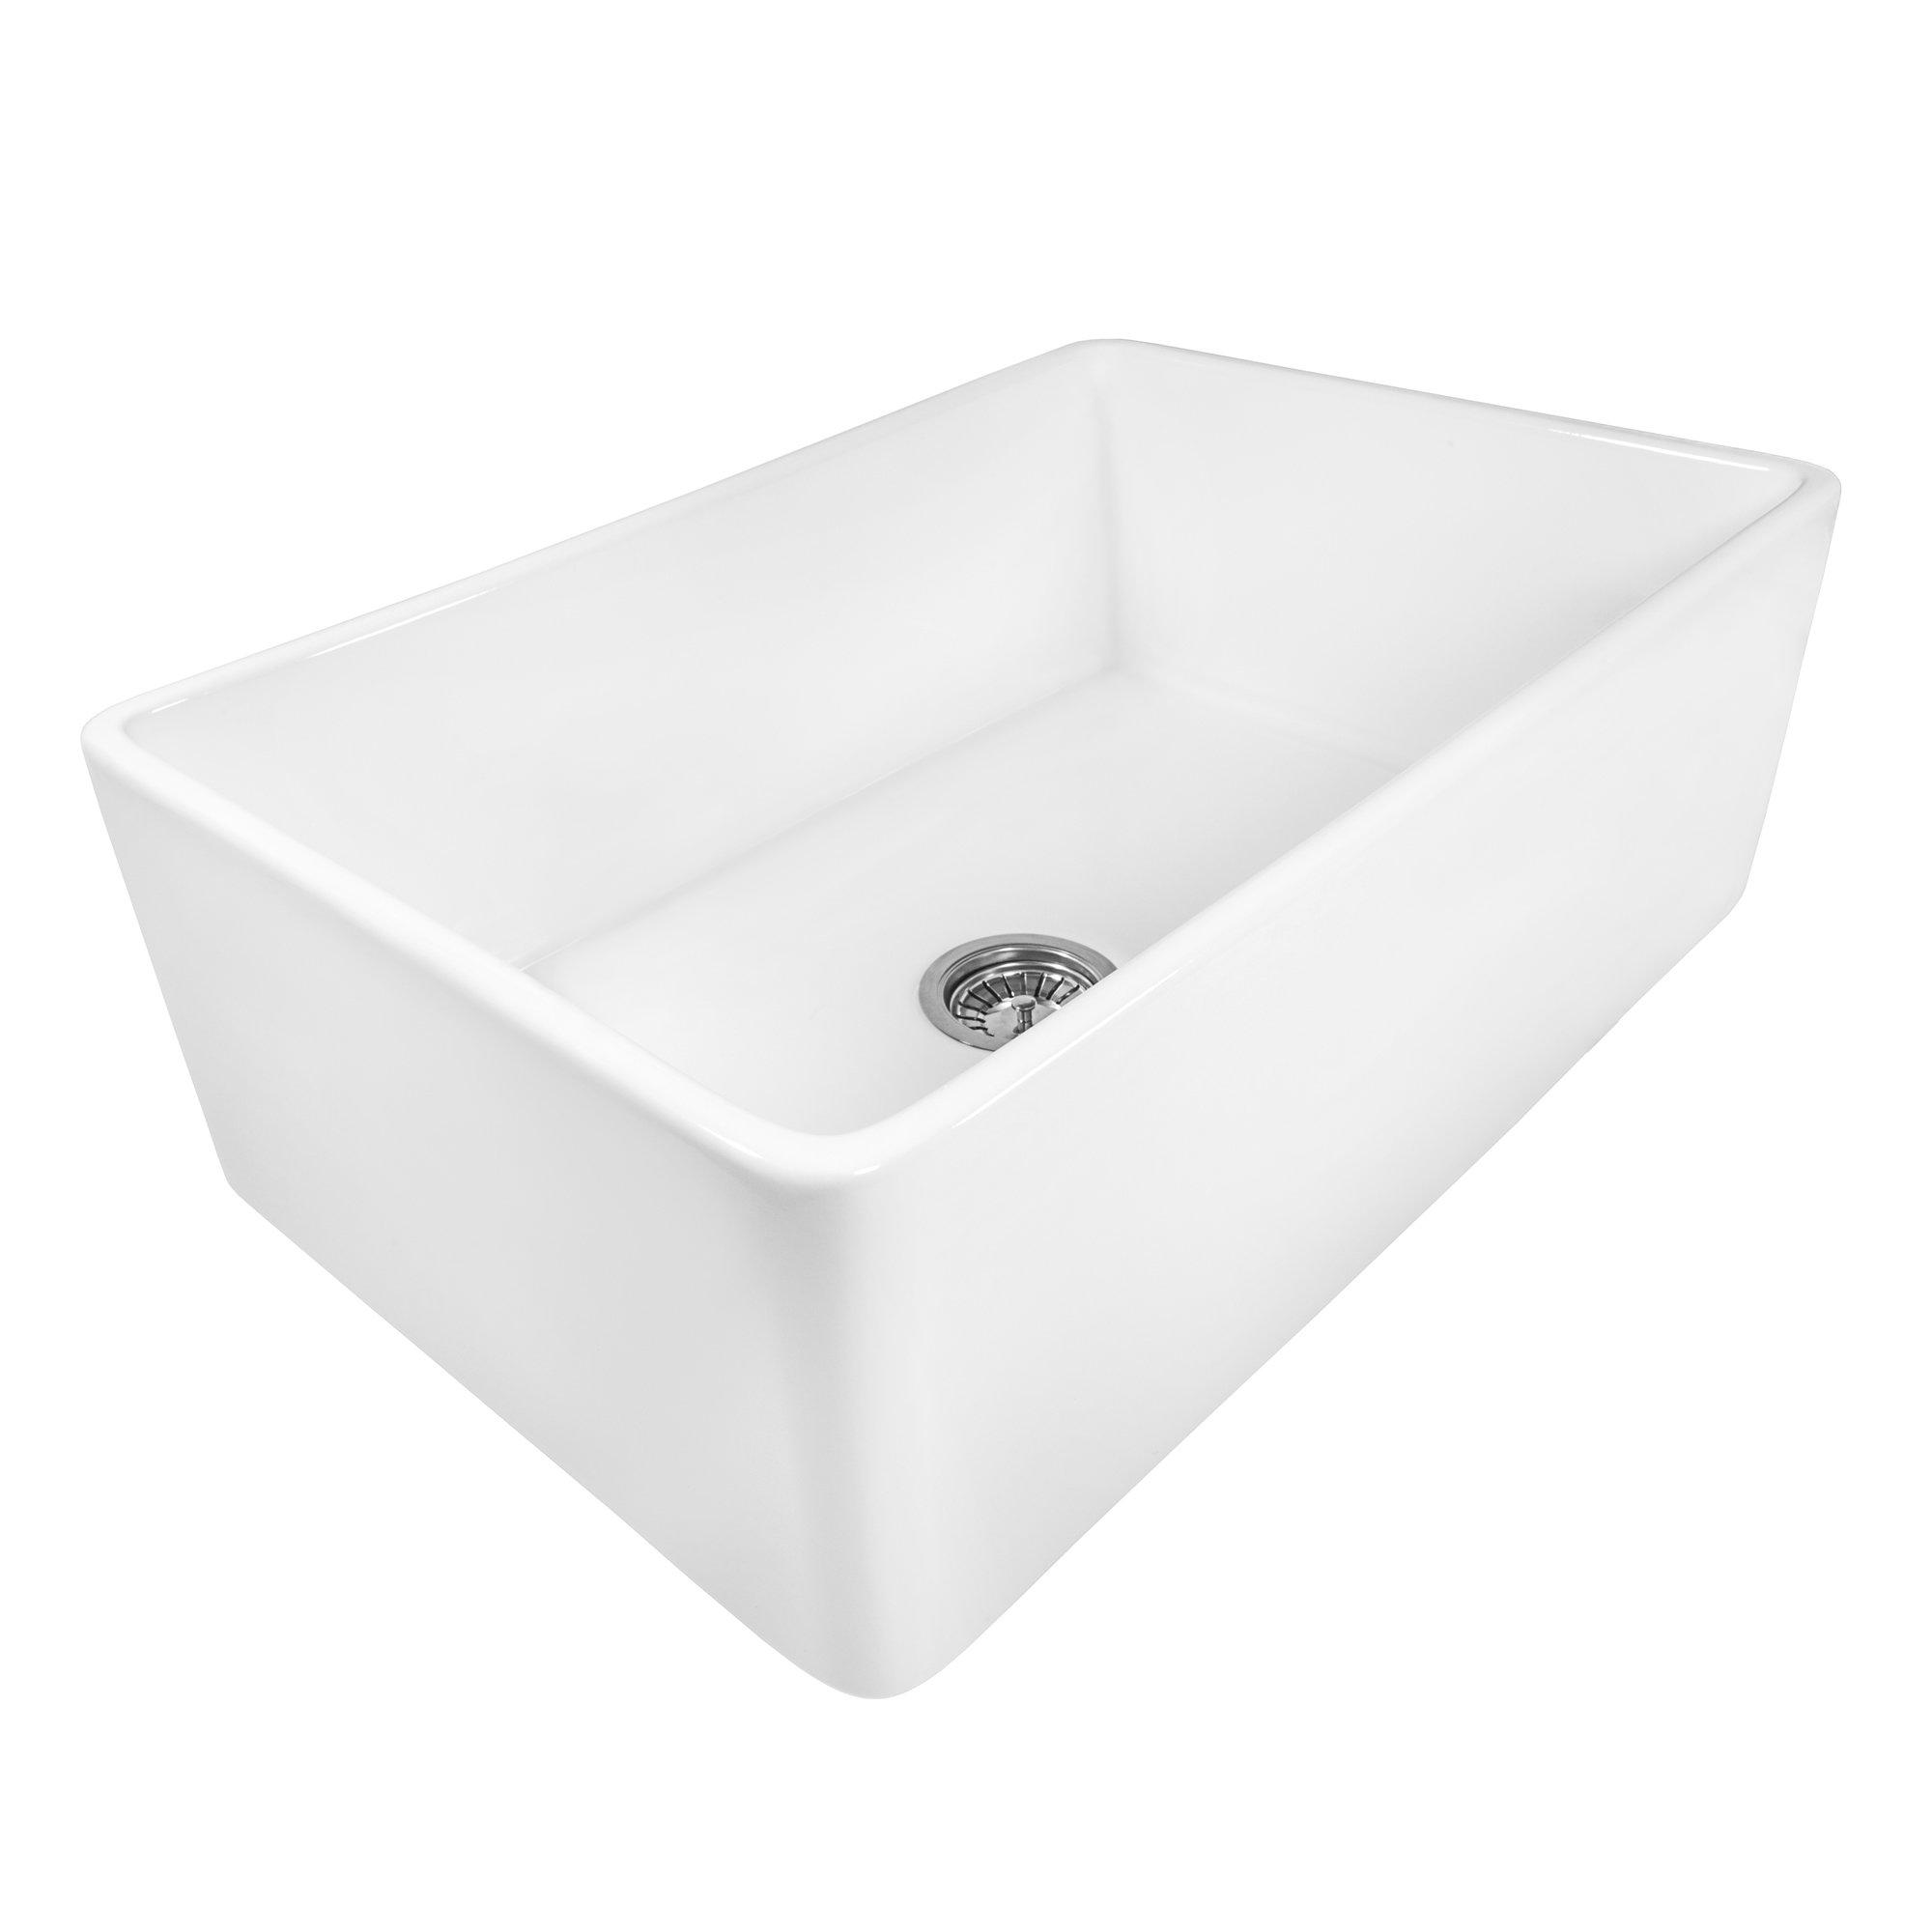 Ruvati 33 x 20 inch Fireclay Reversible Farmhouse Apron-Front Kitchen Sink Single Bowl - White - RVL2300WH by Ruvati